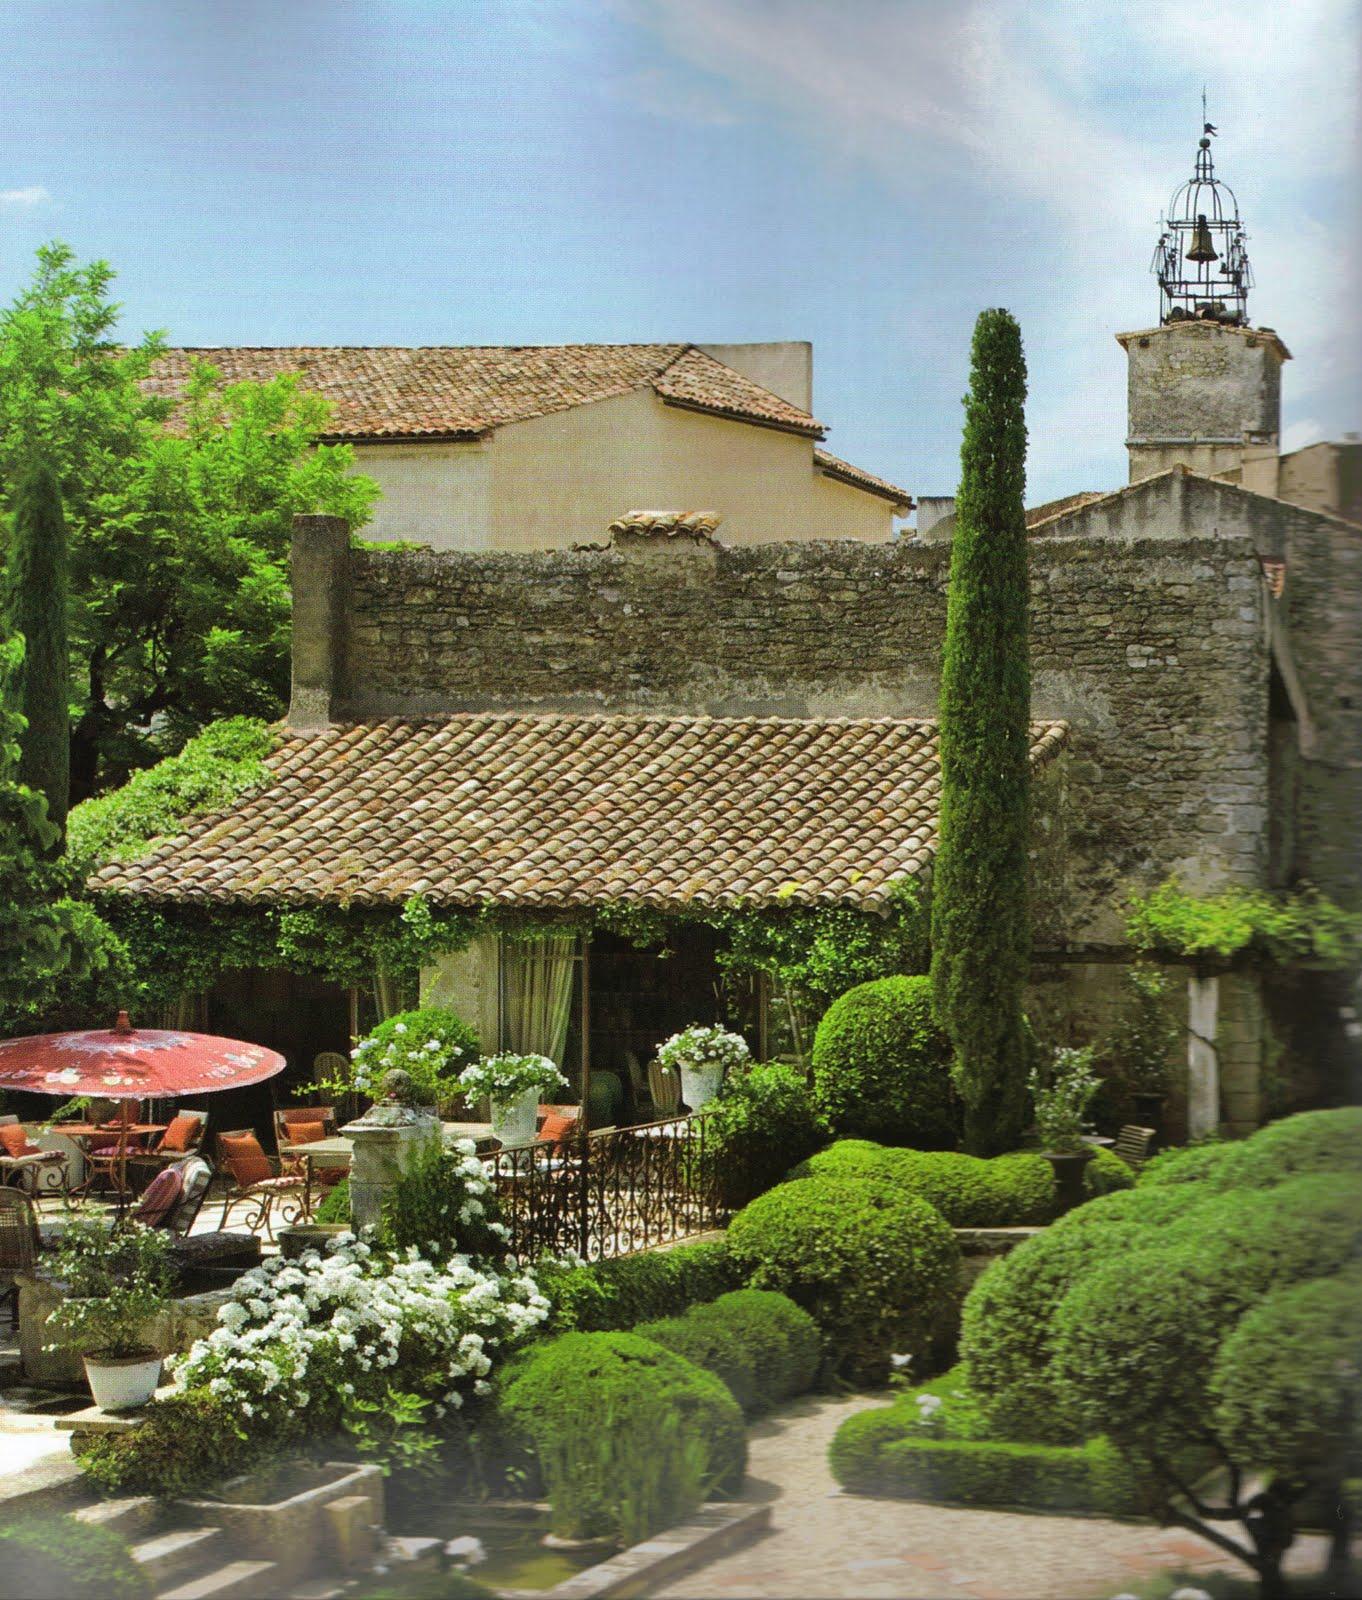 Splendid Sass: Michel Biehn, Interior Designer in Provence